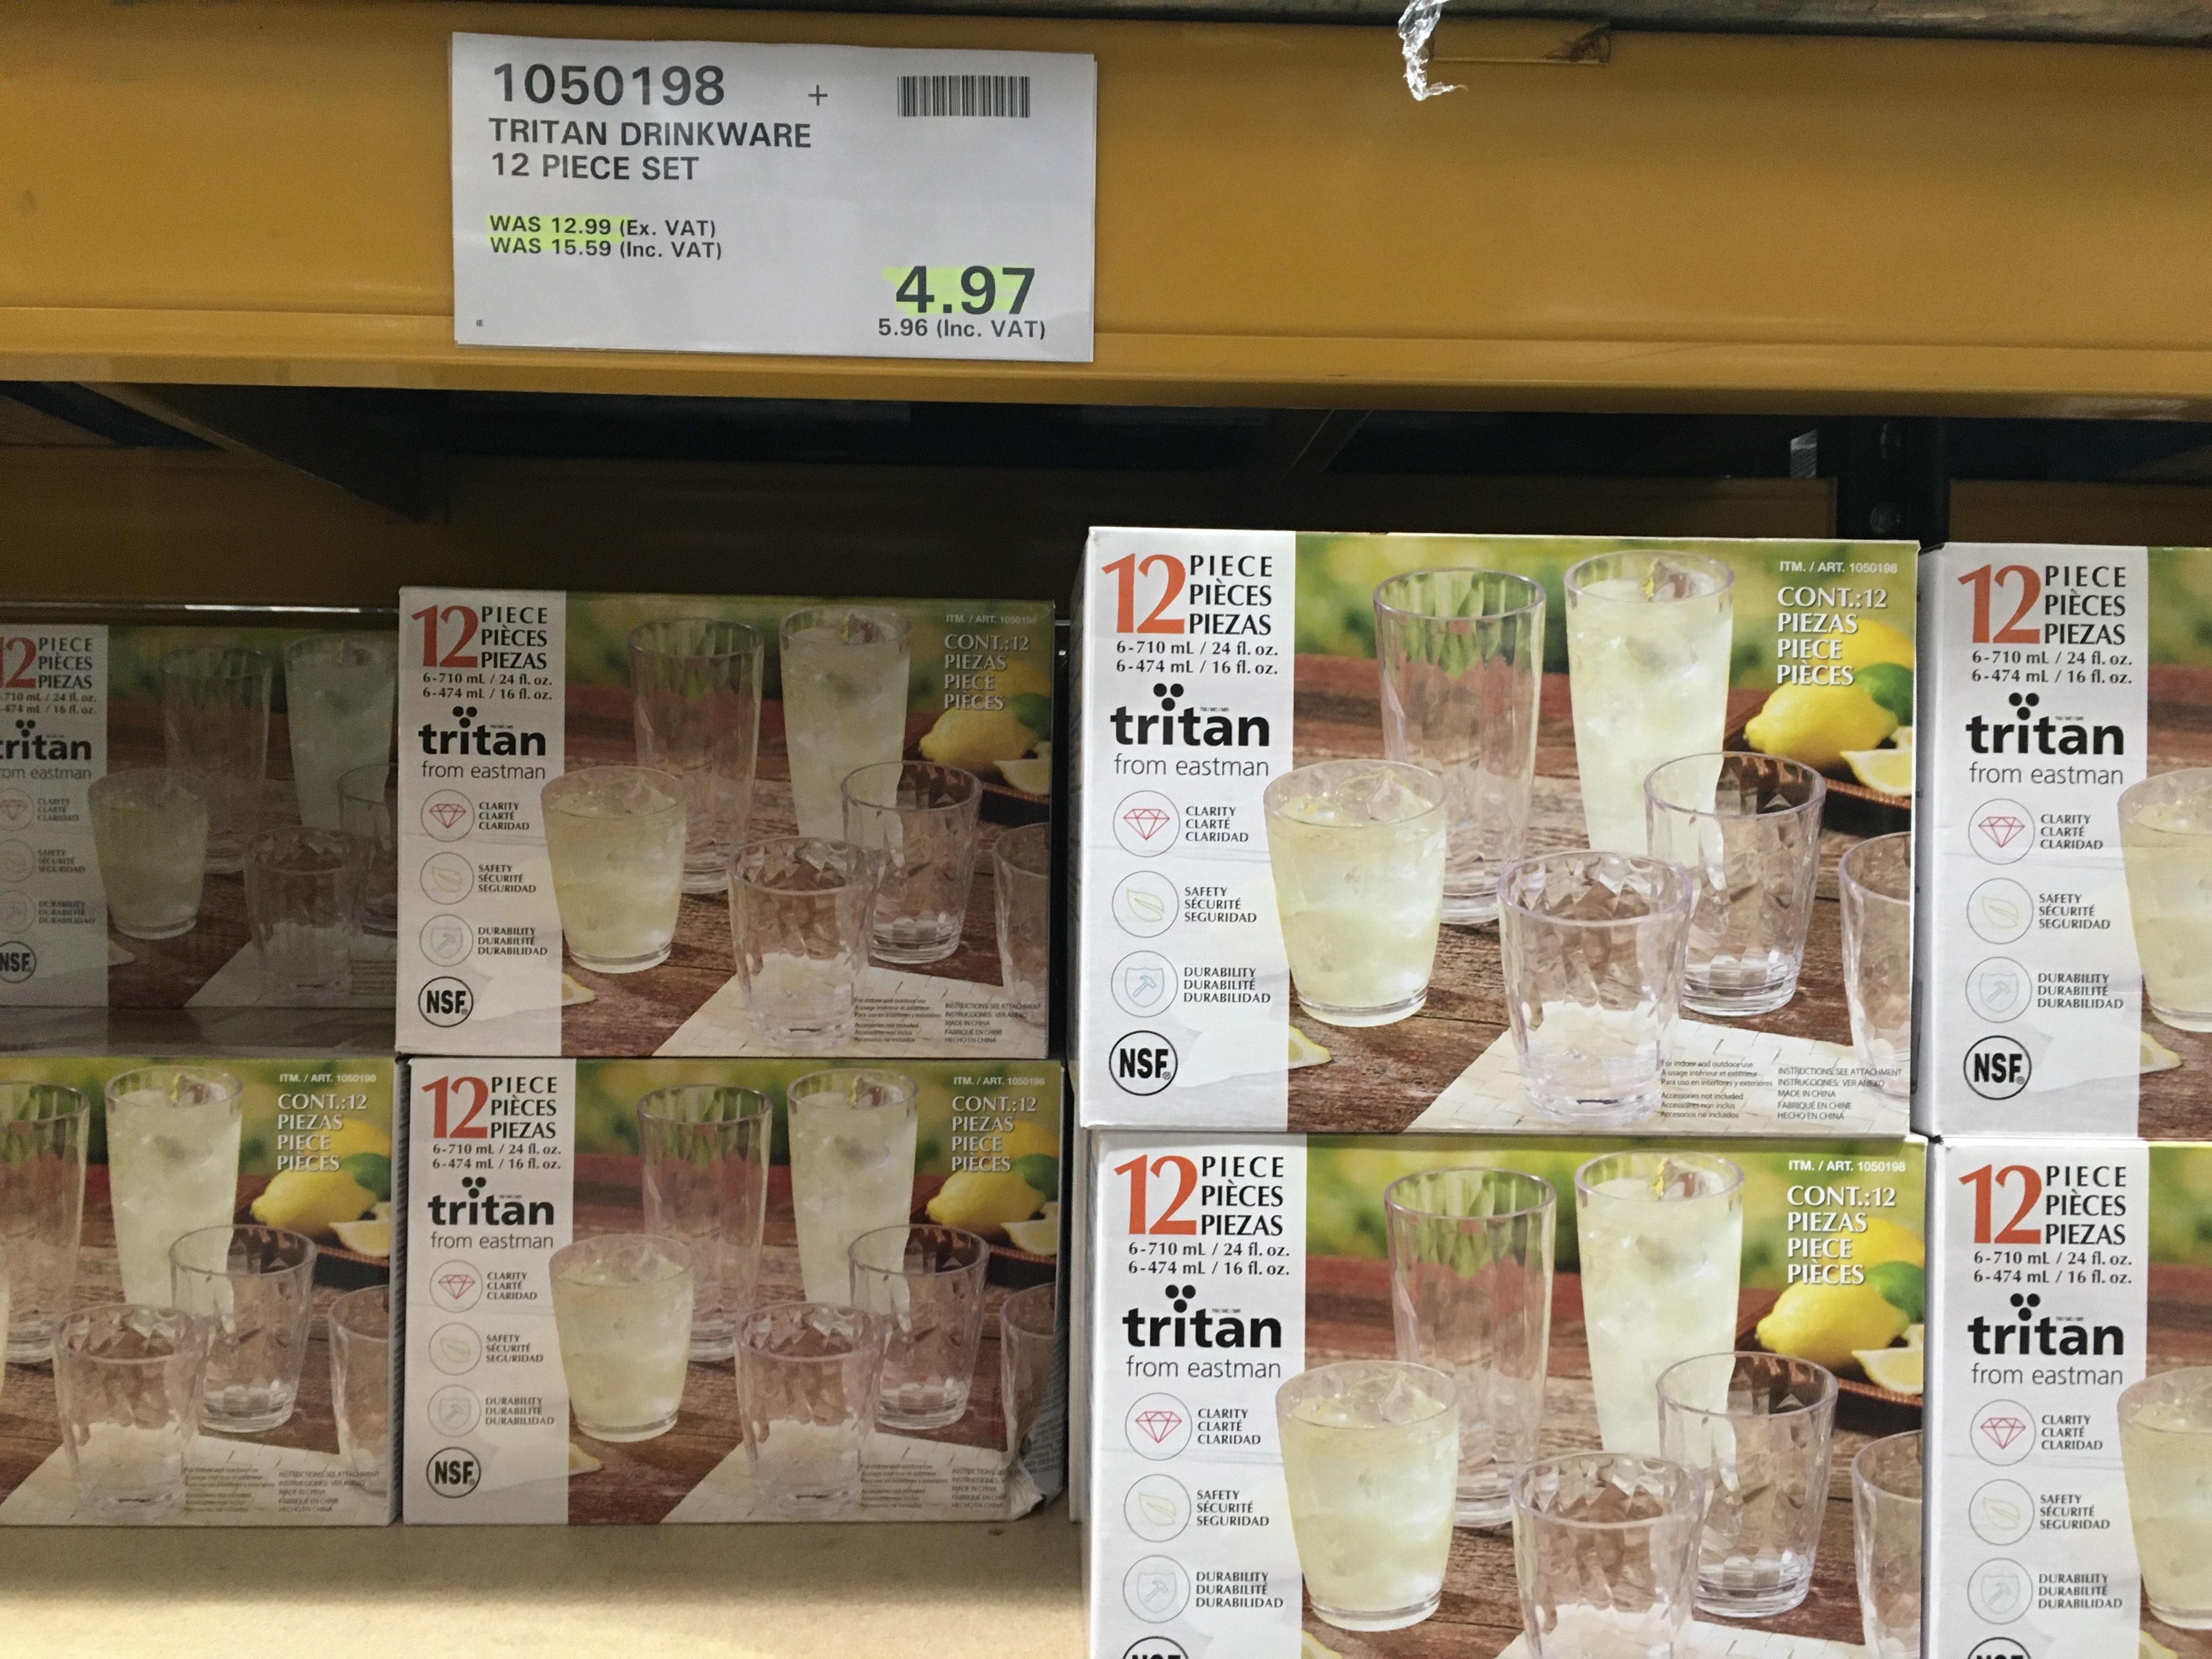 12 Glasses was 15.59 pus VAT now 4.97 plus VAT @ Costco (Bristol)